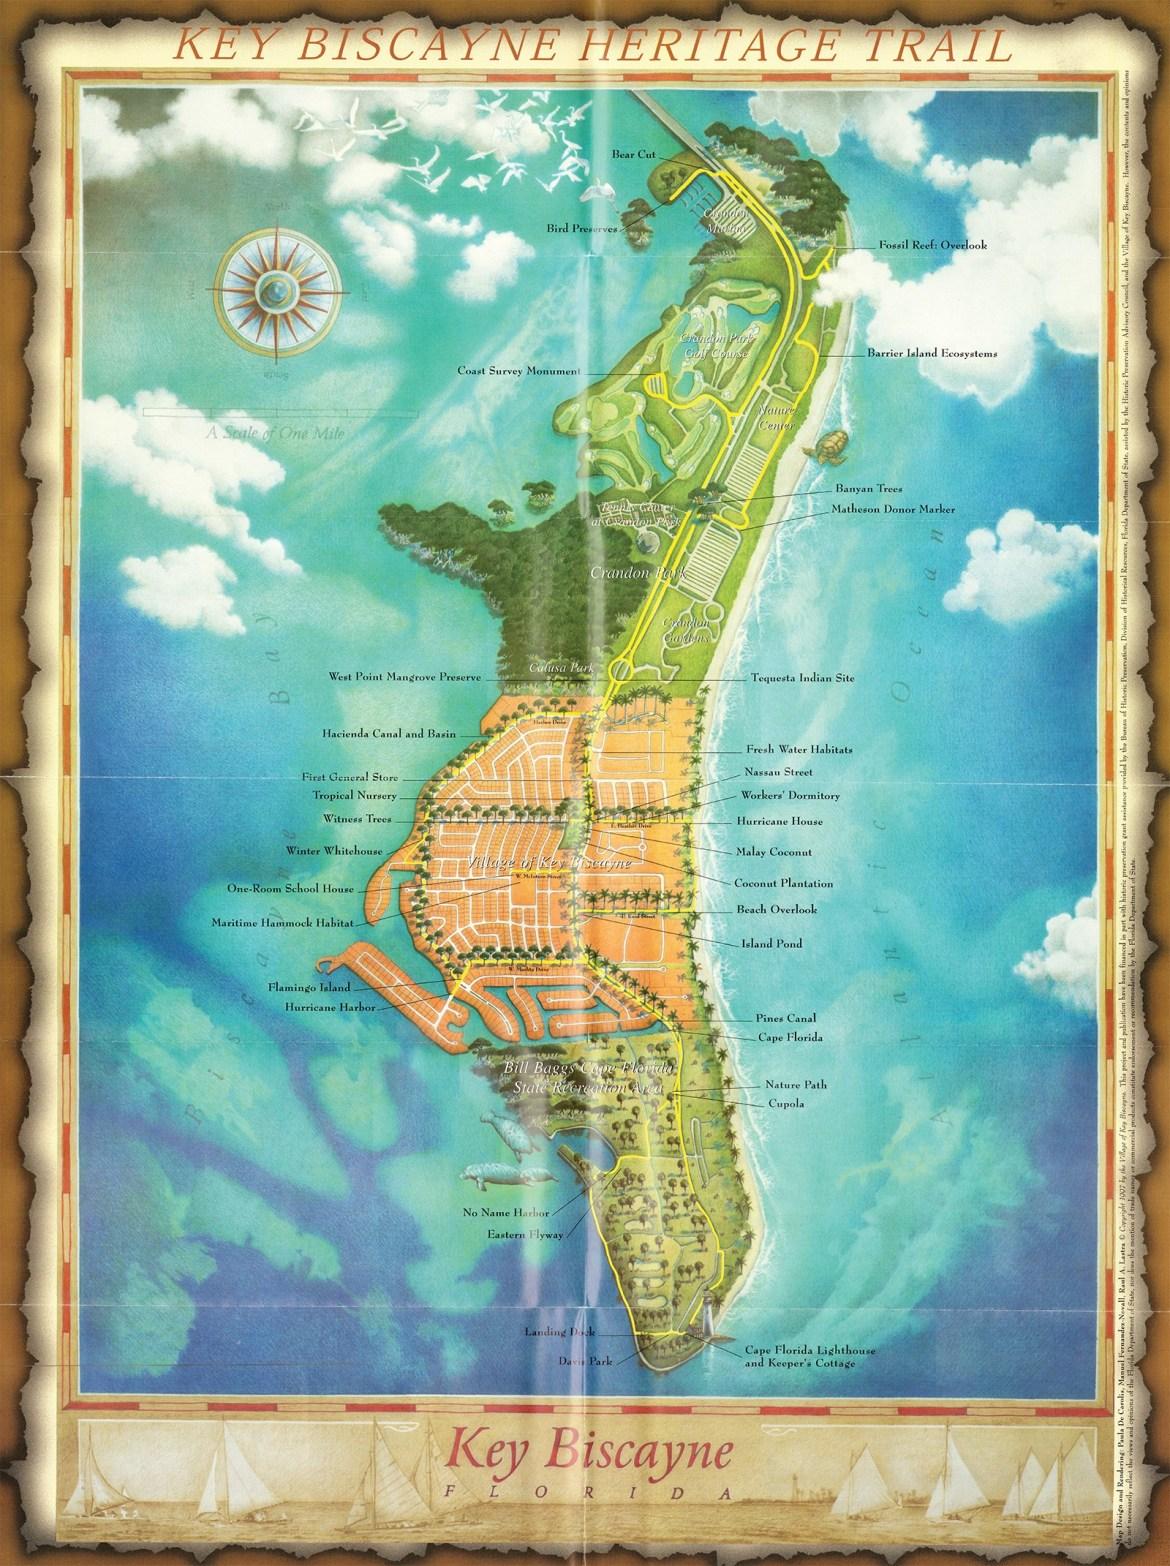 key-biscayne-heritage-trail-map-full.jpg